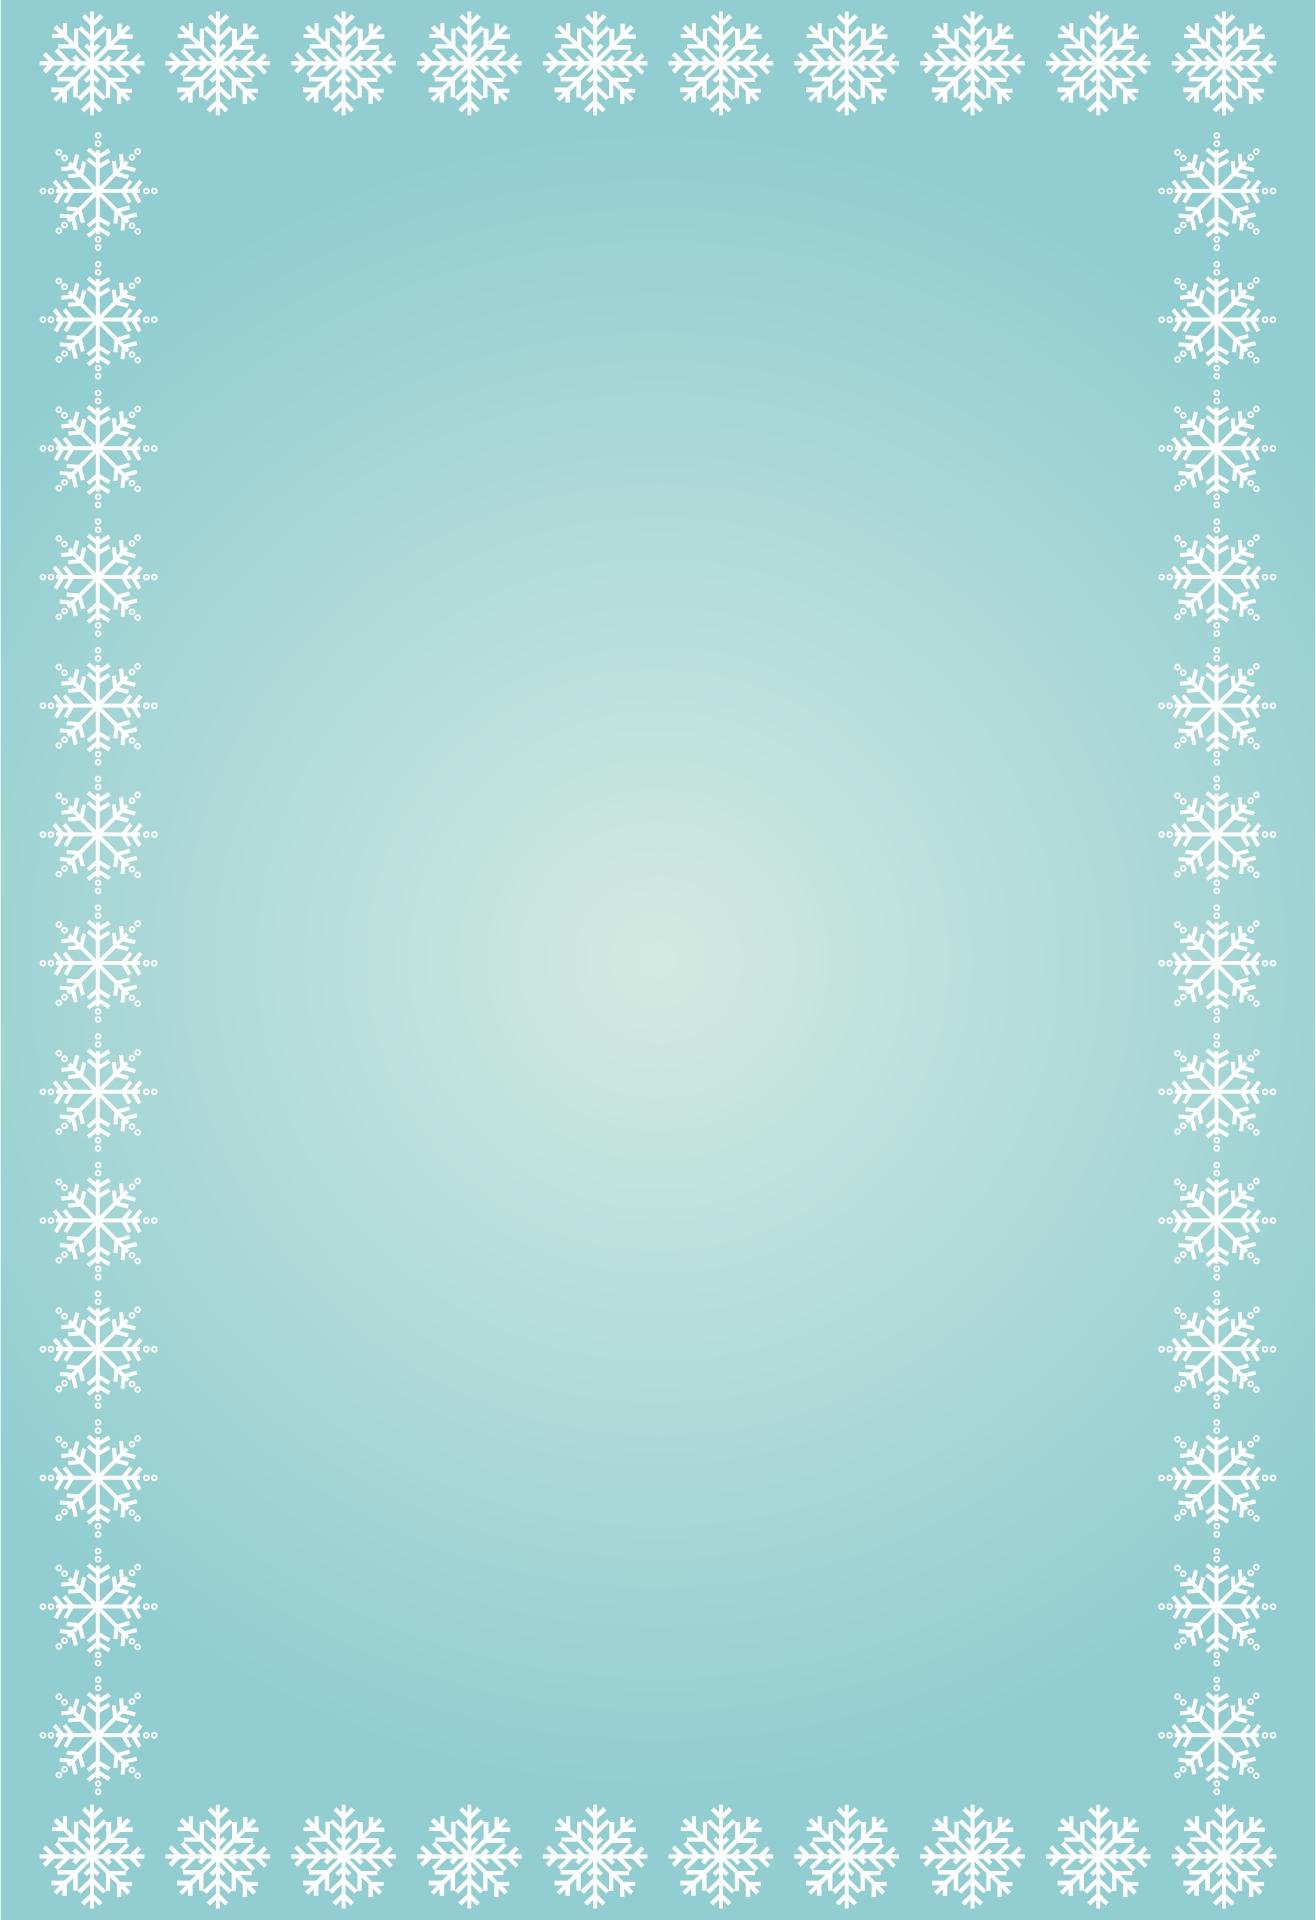 Snowflake Border Paper